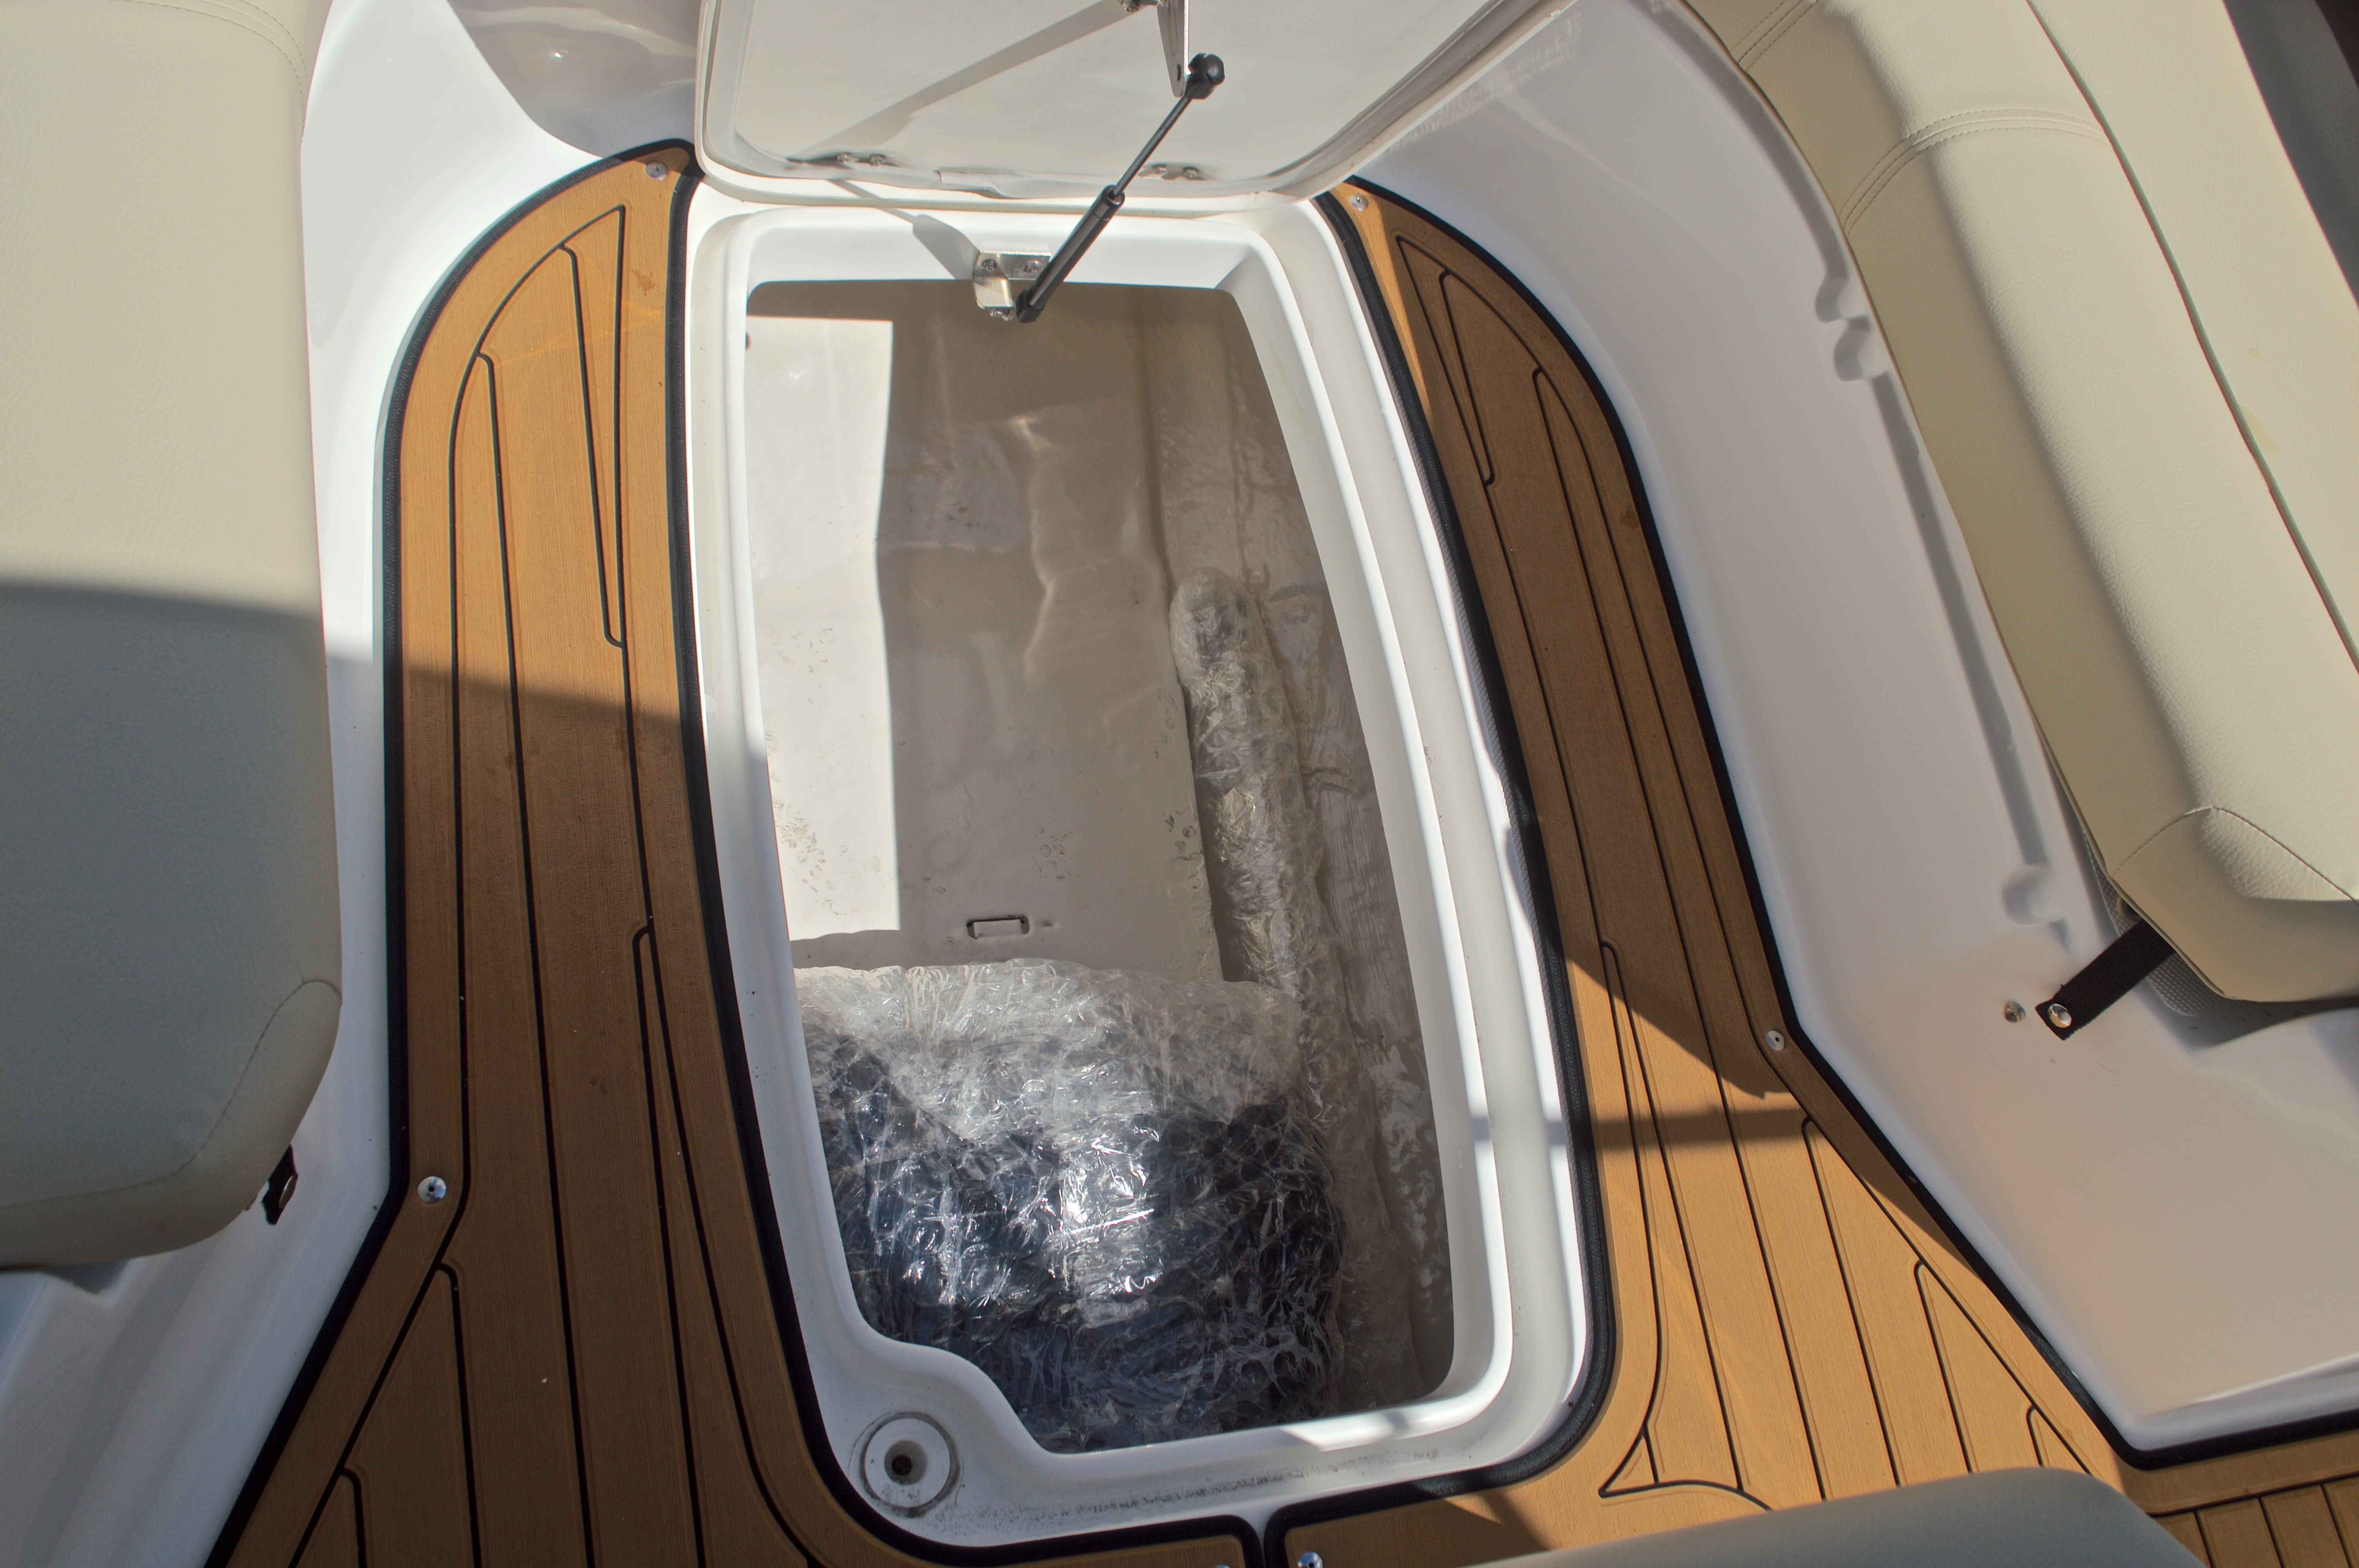 Thumbnail 47 for New 2017 Hurricane CC21 Center Console boat for sale in Vero Beach, FL